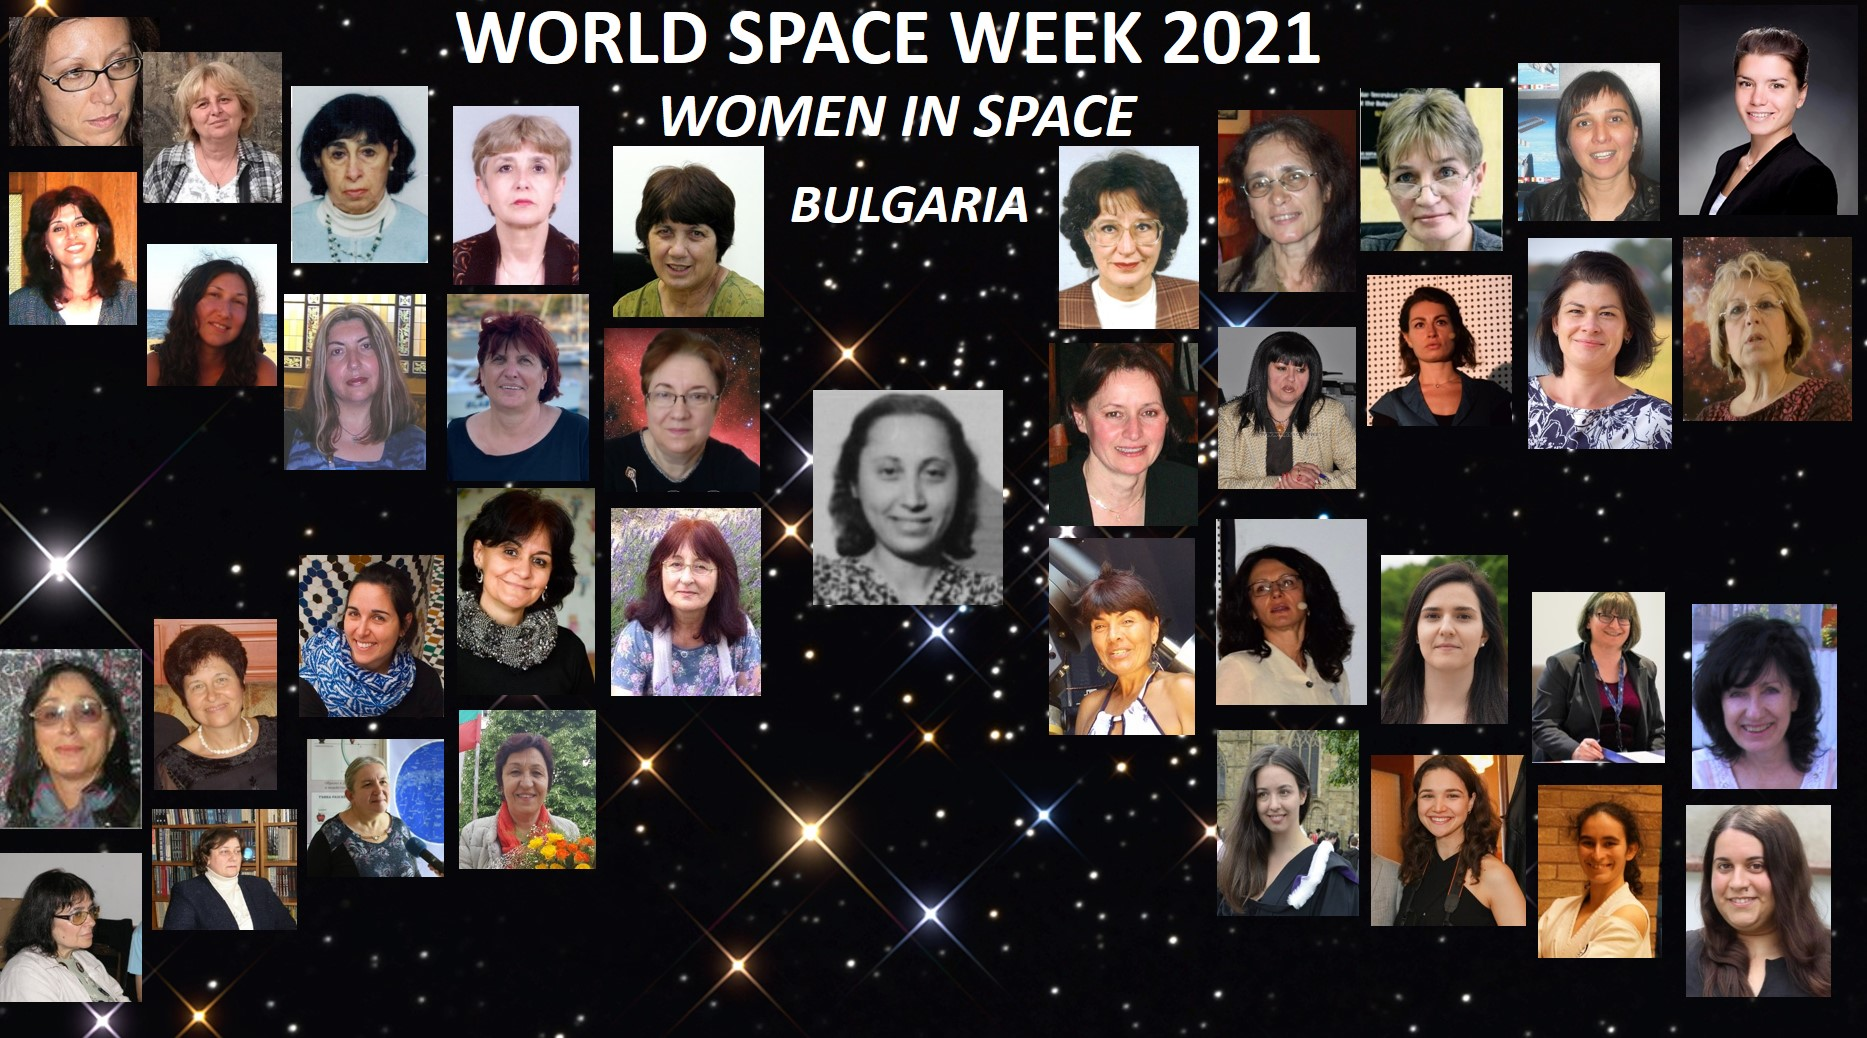 wsw_women_in_space_bulgaria_4okt2021